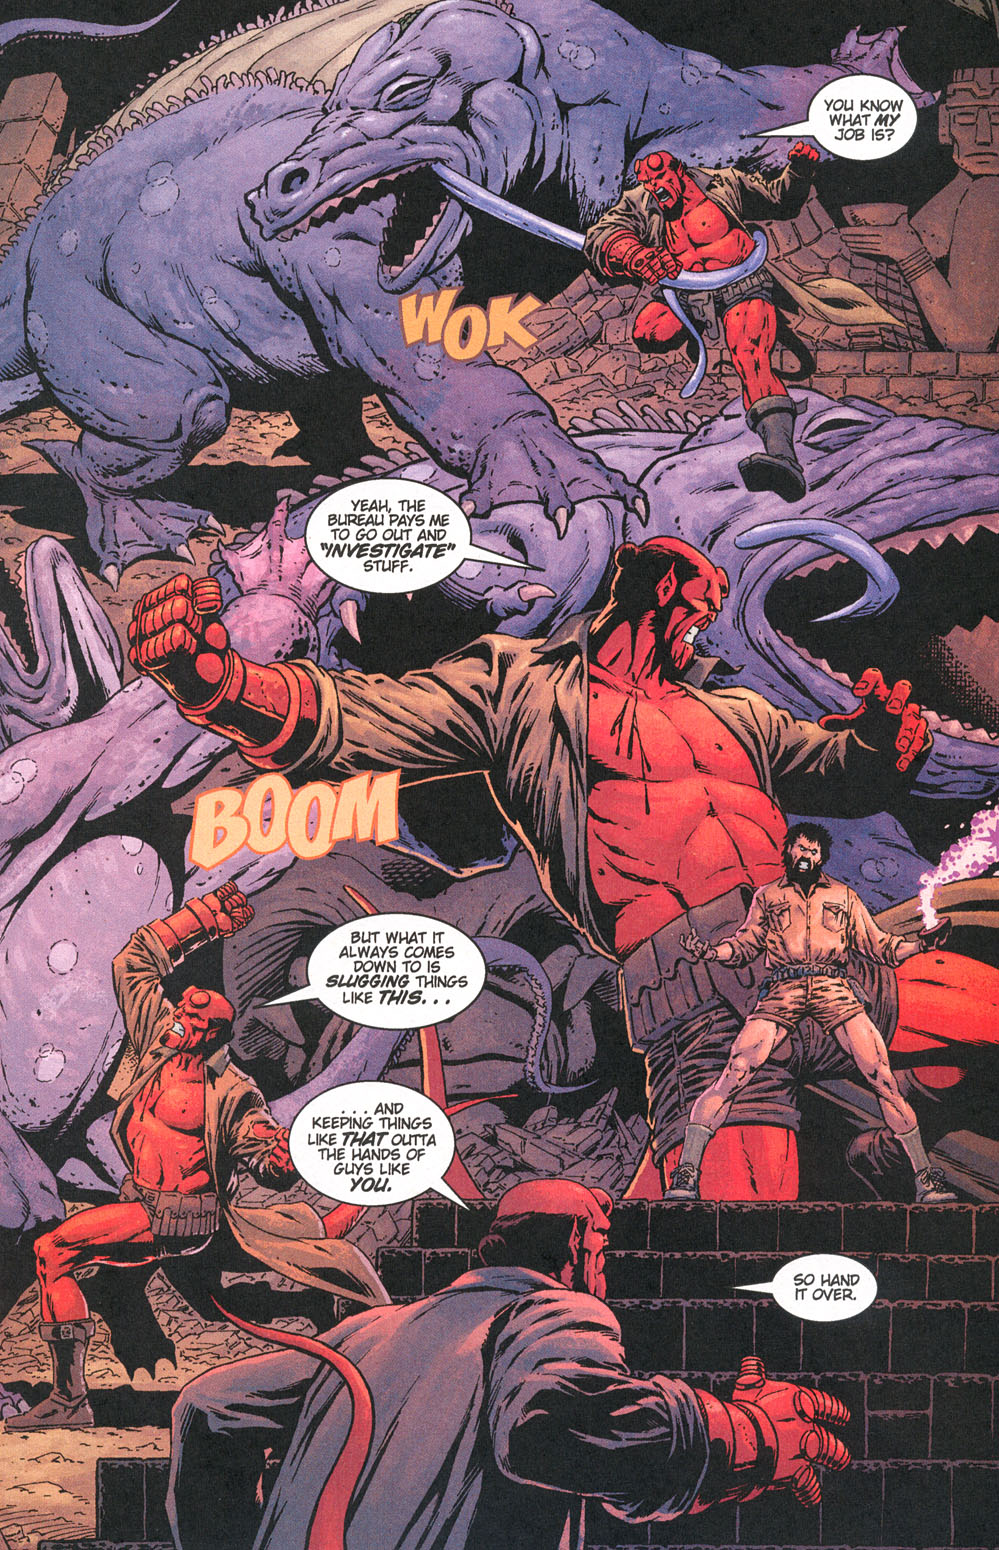 Read online Hellboy: Weird Tales comic -  Issue #5 - 21